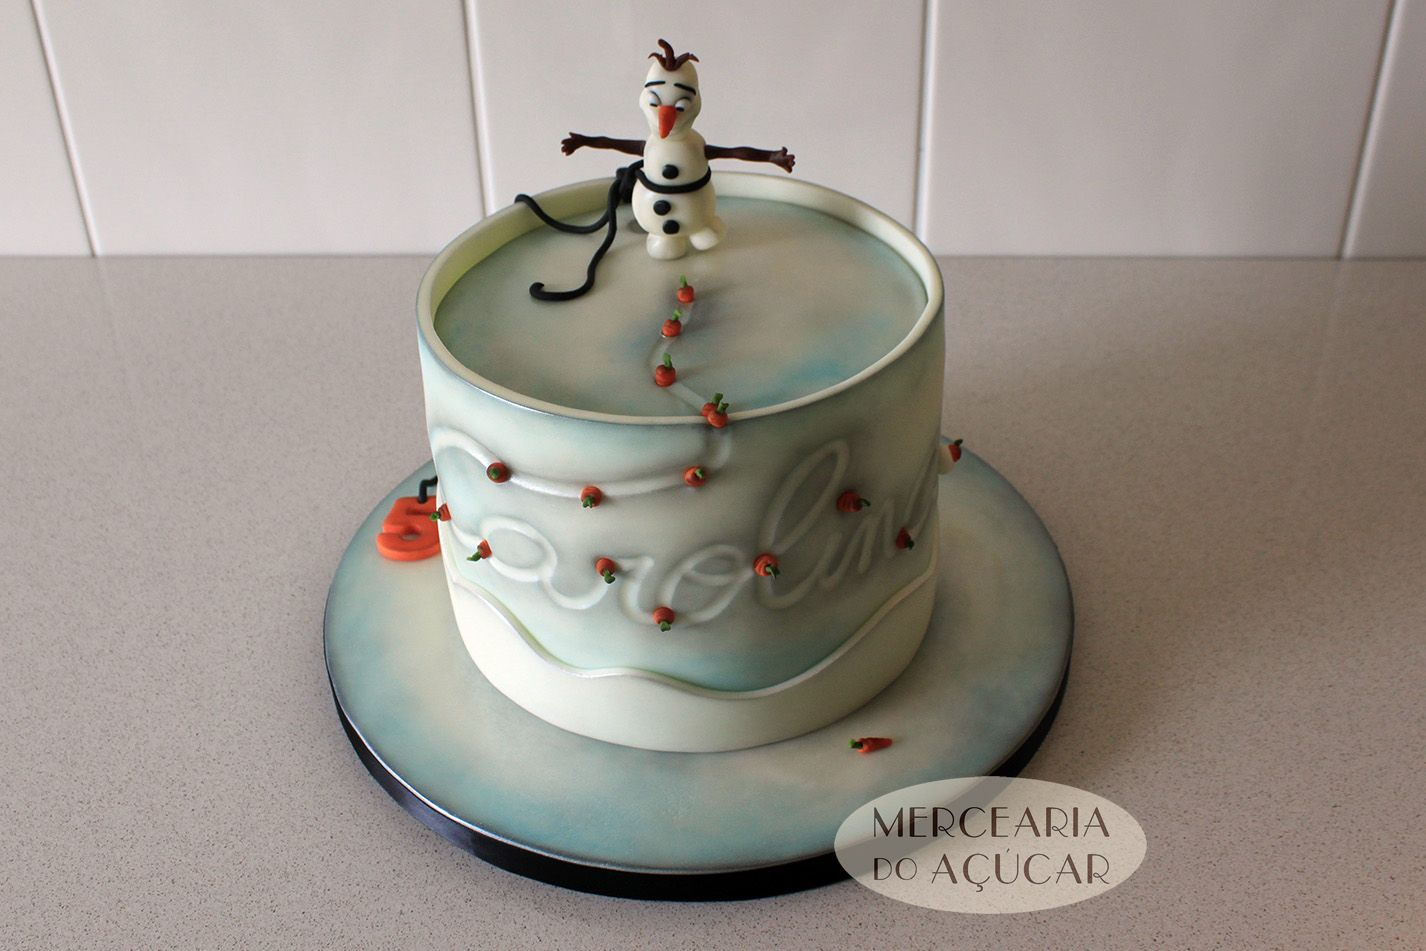 Frozen cake design images  Frozen Olaf Carrots Cake  Bolo Cenouras do Olaf  Cake Design